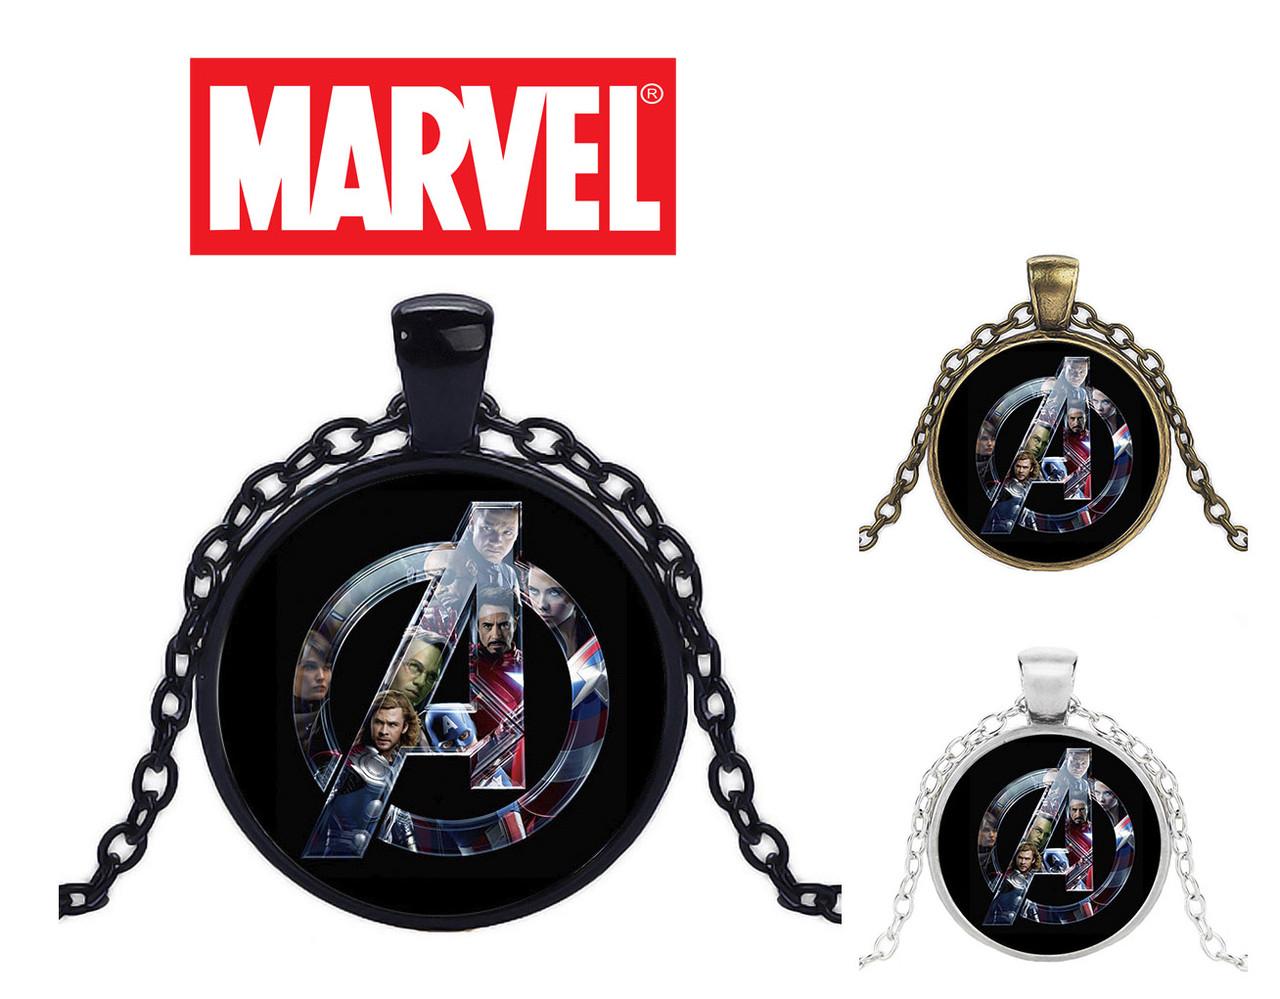 Кулон с изображением с логотипом и персонажами Avengers Мстители